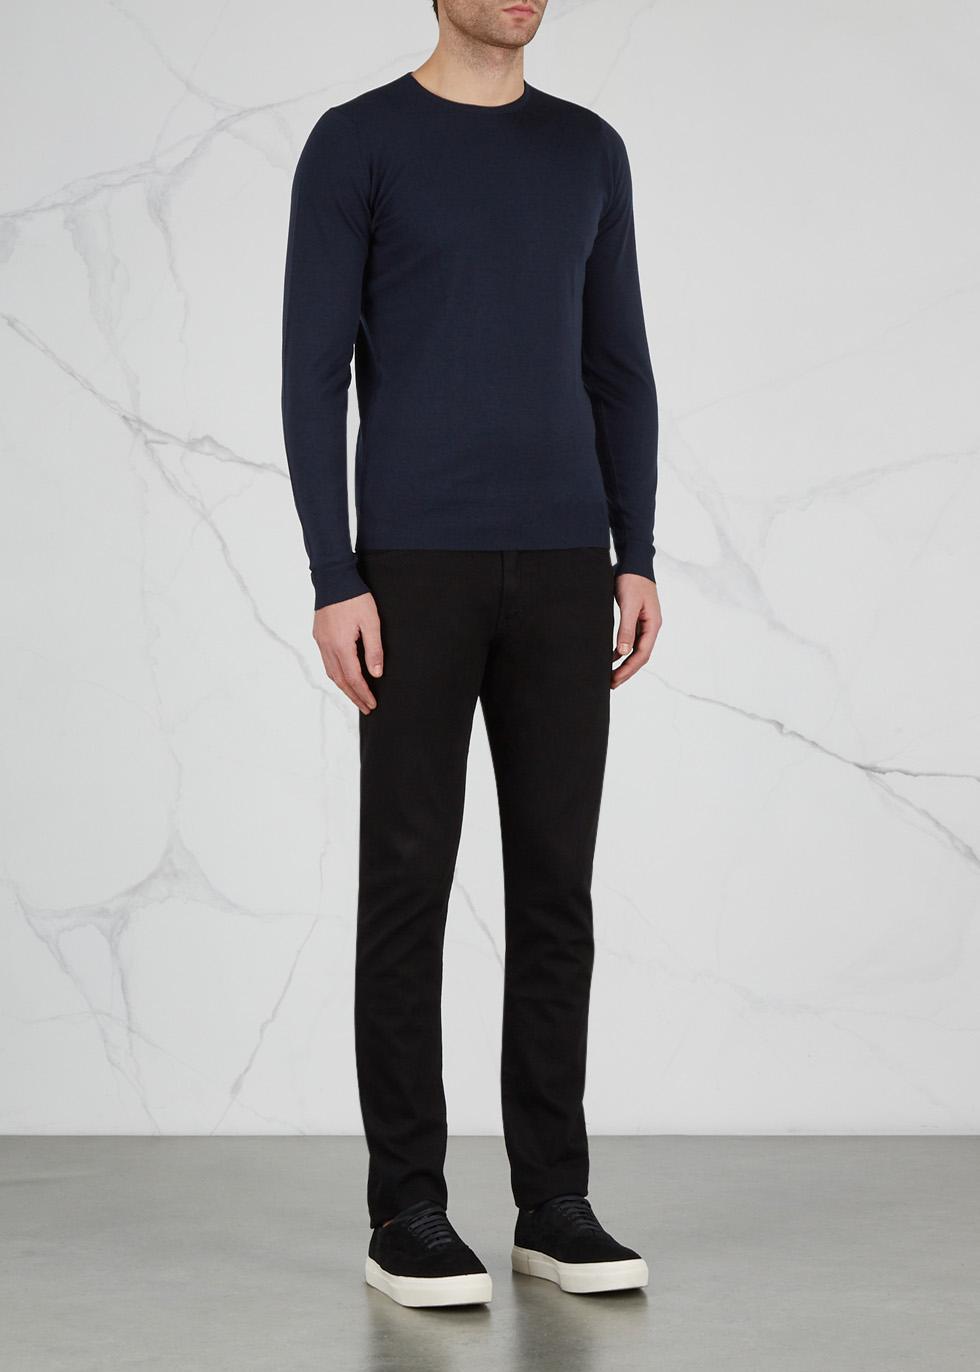 Lundy navy fine-knit wool jumper - John Smedley